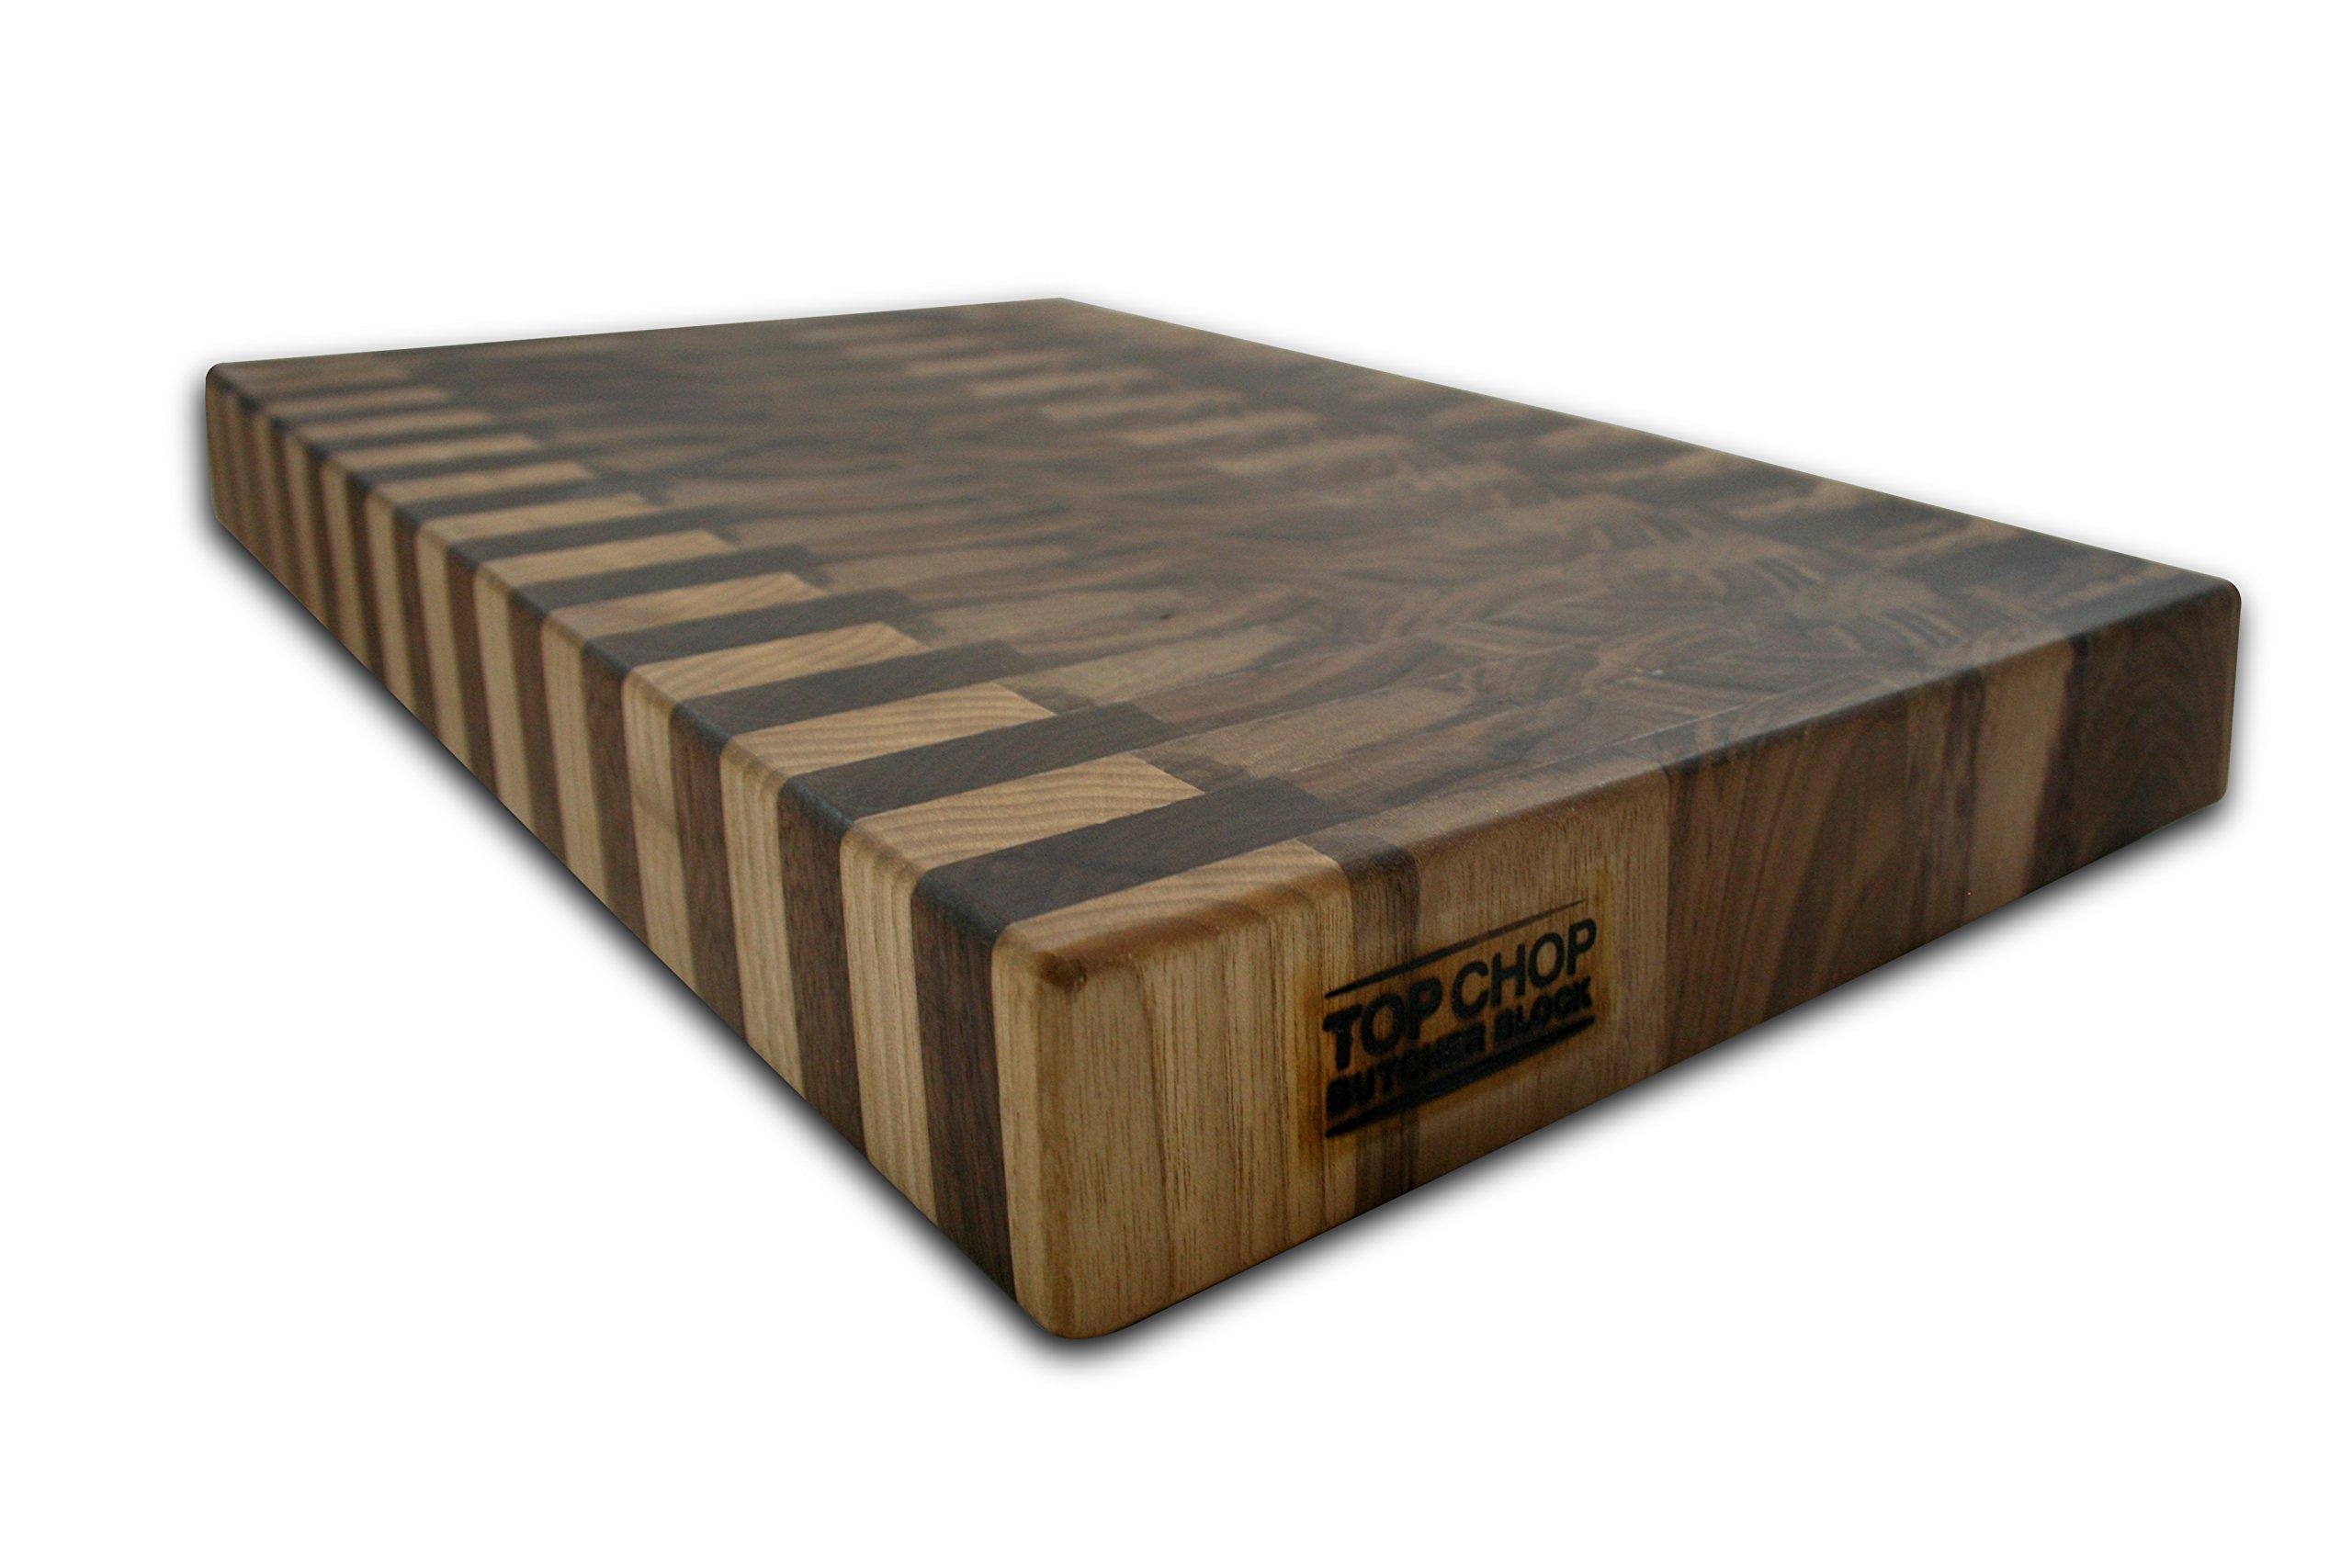 Top Chop Butcher Block Premium Reversible End Grain Cutting Board, Walnut, 12'' x 18'' x 2''